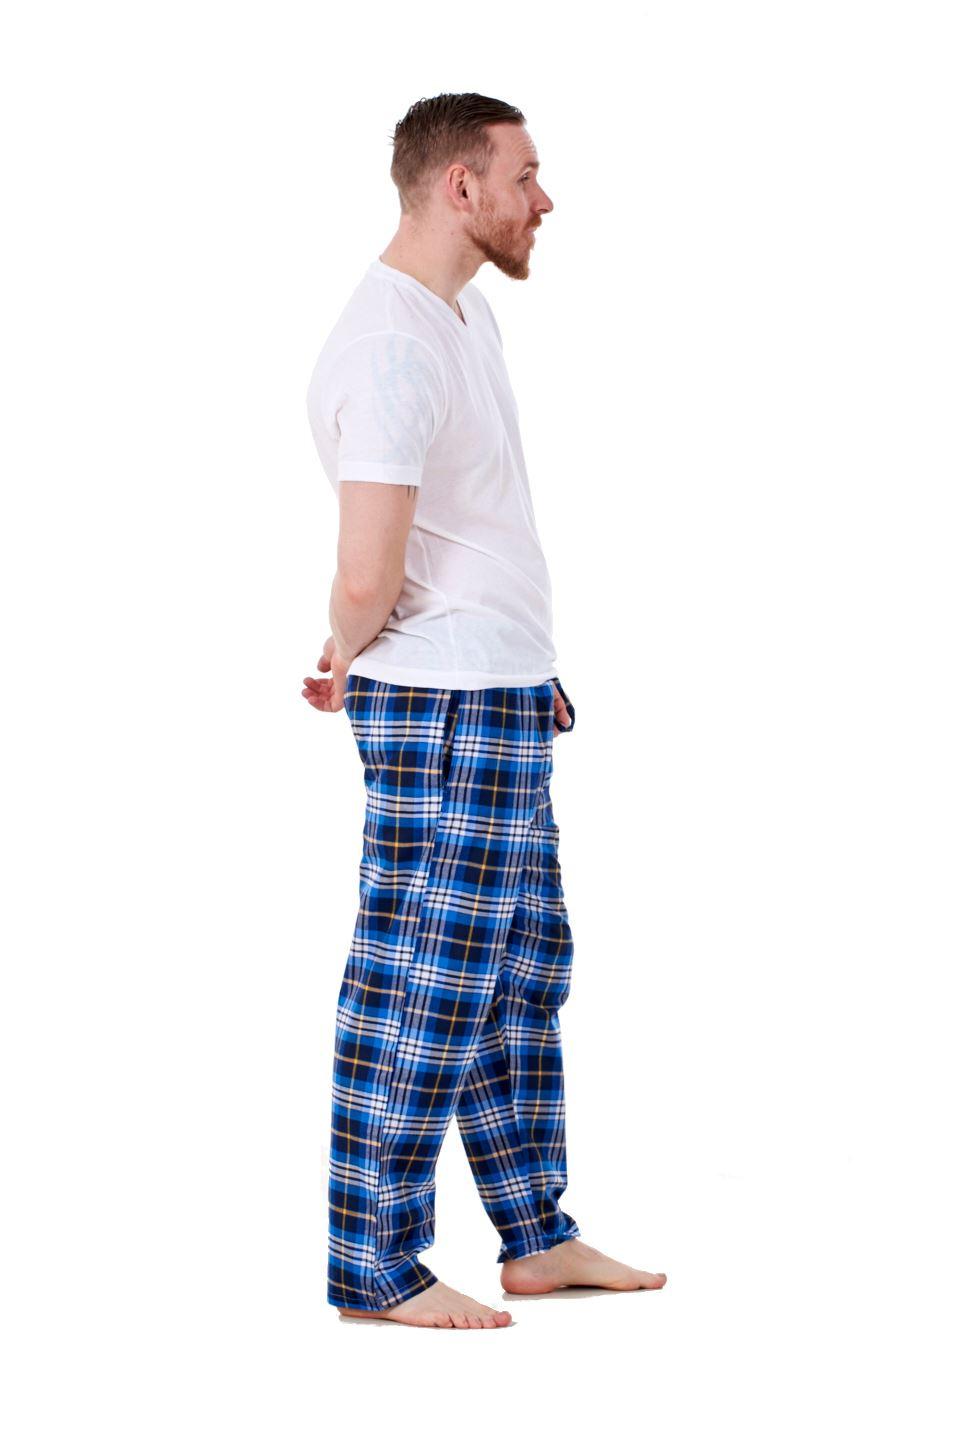 Mens-Pyjama-Bottoms-Rich-Cotton-Woven-Check-Lounge-Pant-Nightwear-Big-3XL-to-5XL Indexbild 62